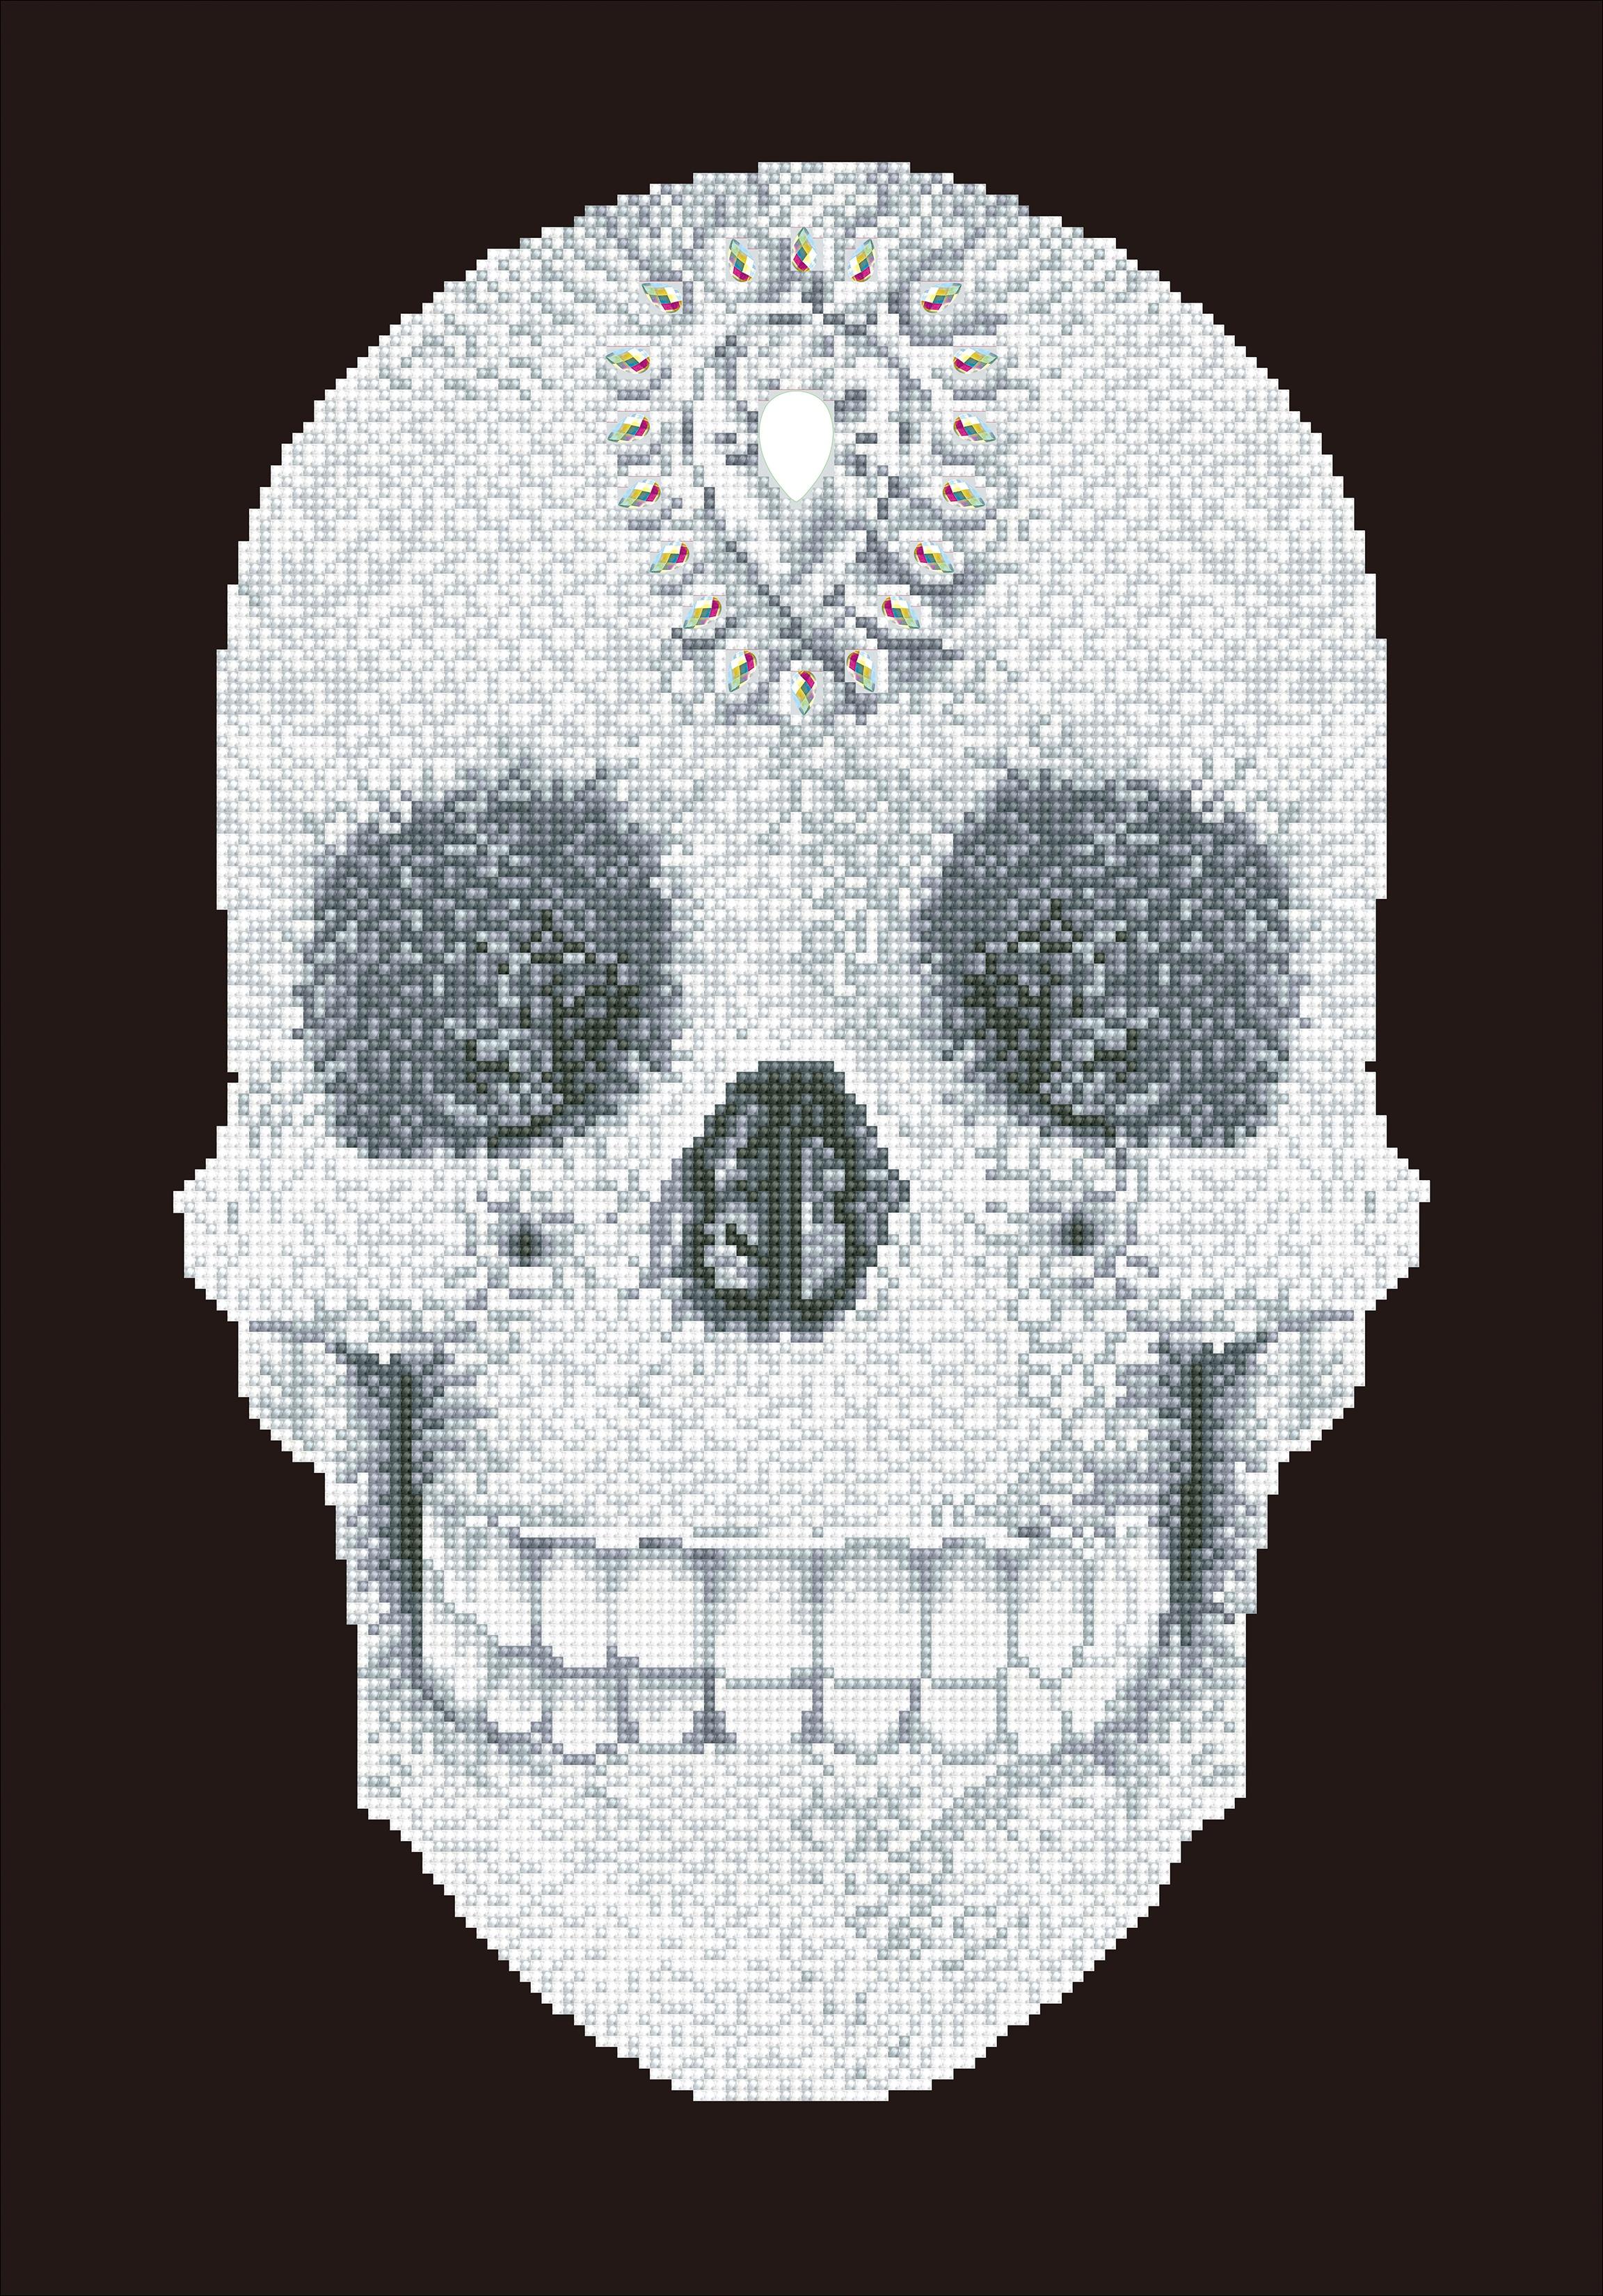 Diamond Dotz Diamond Embroidery Facet Art Kit 16.5X20.5-Crystal Skull